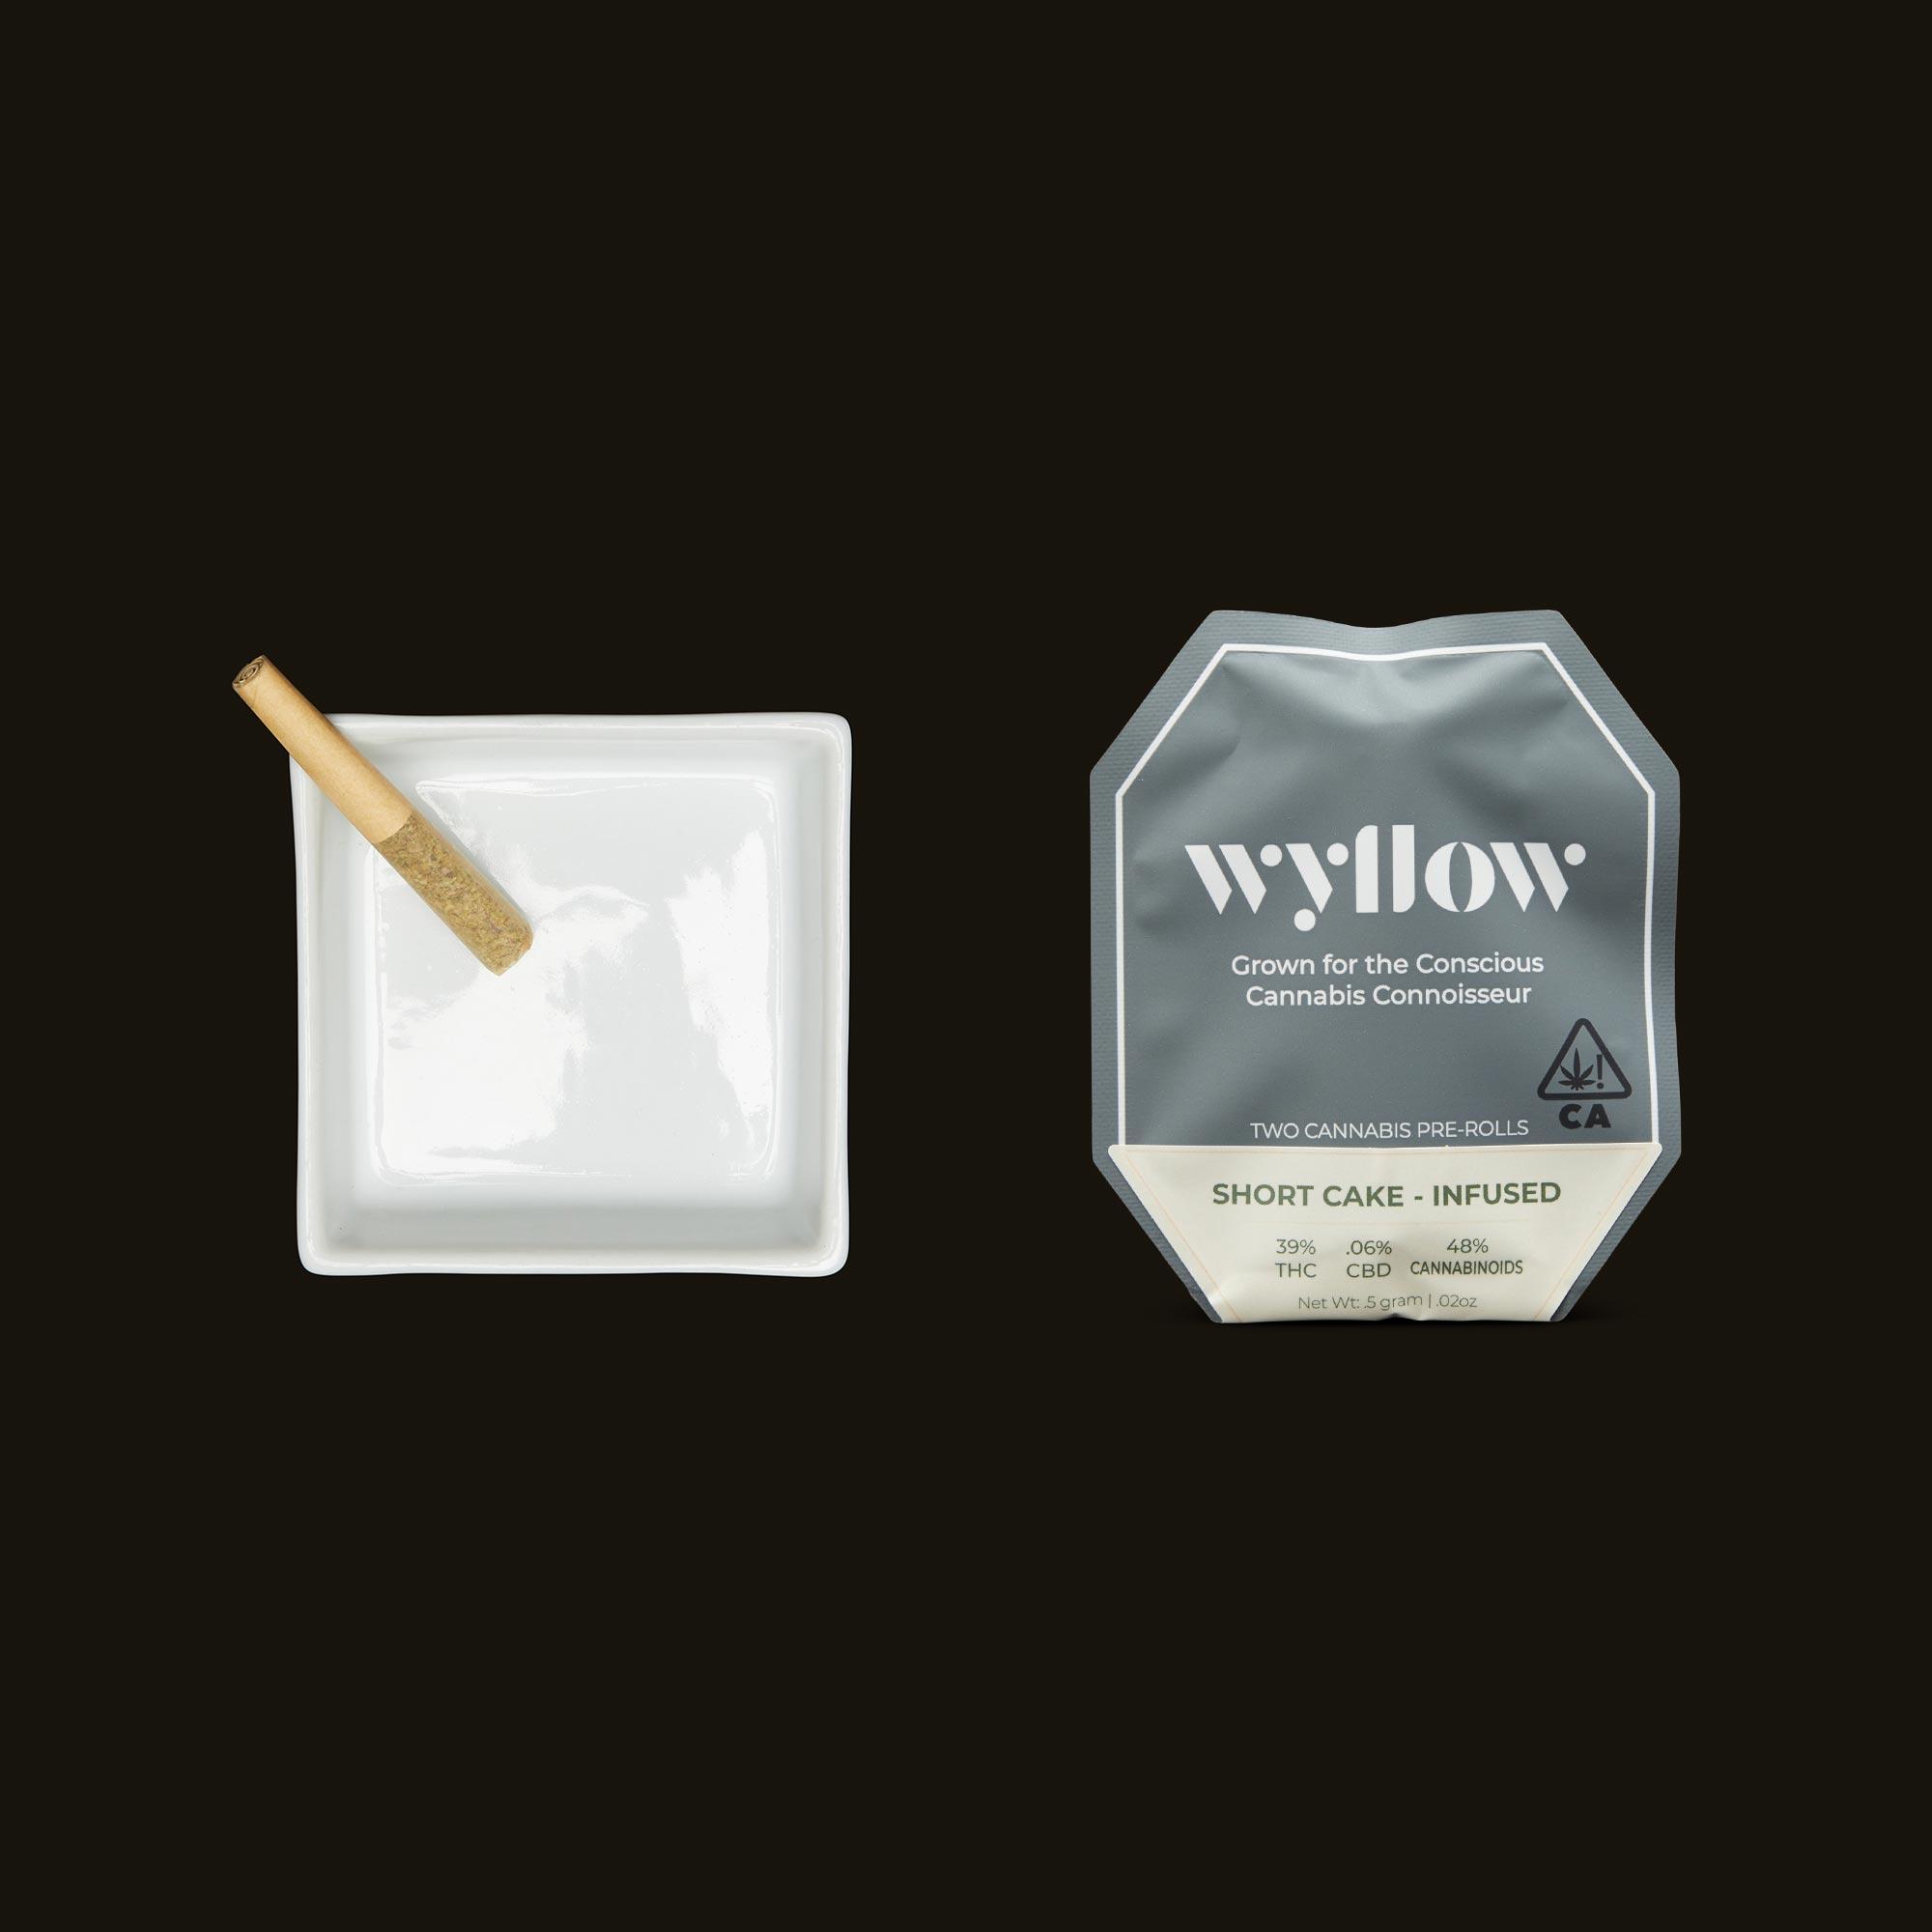 Wyllow Short Cake Infused Pre-Rolls